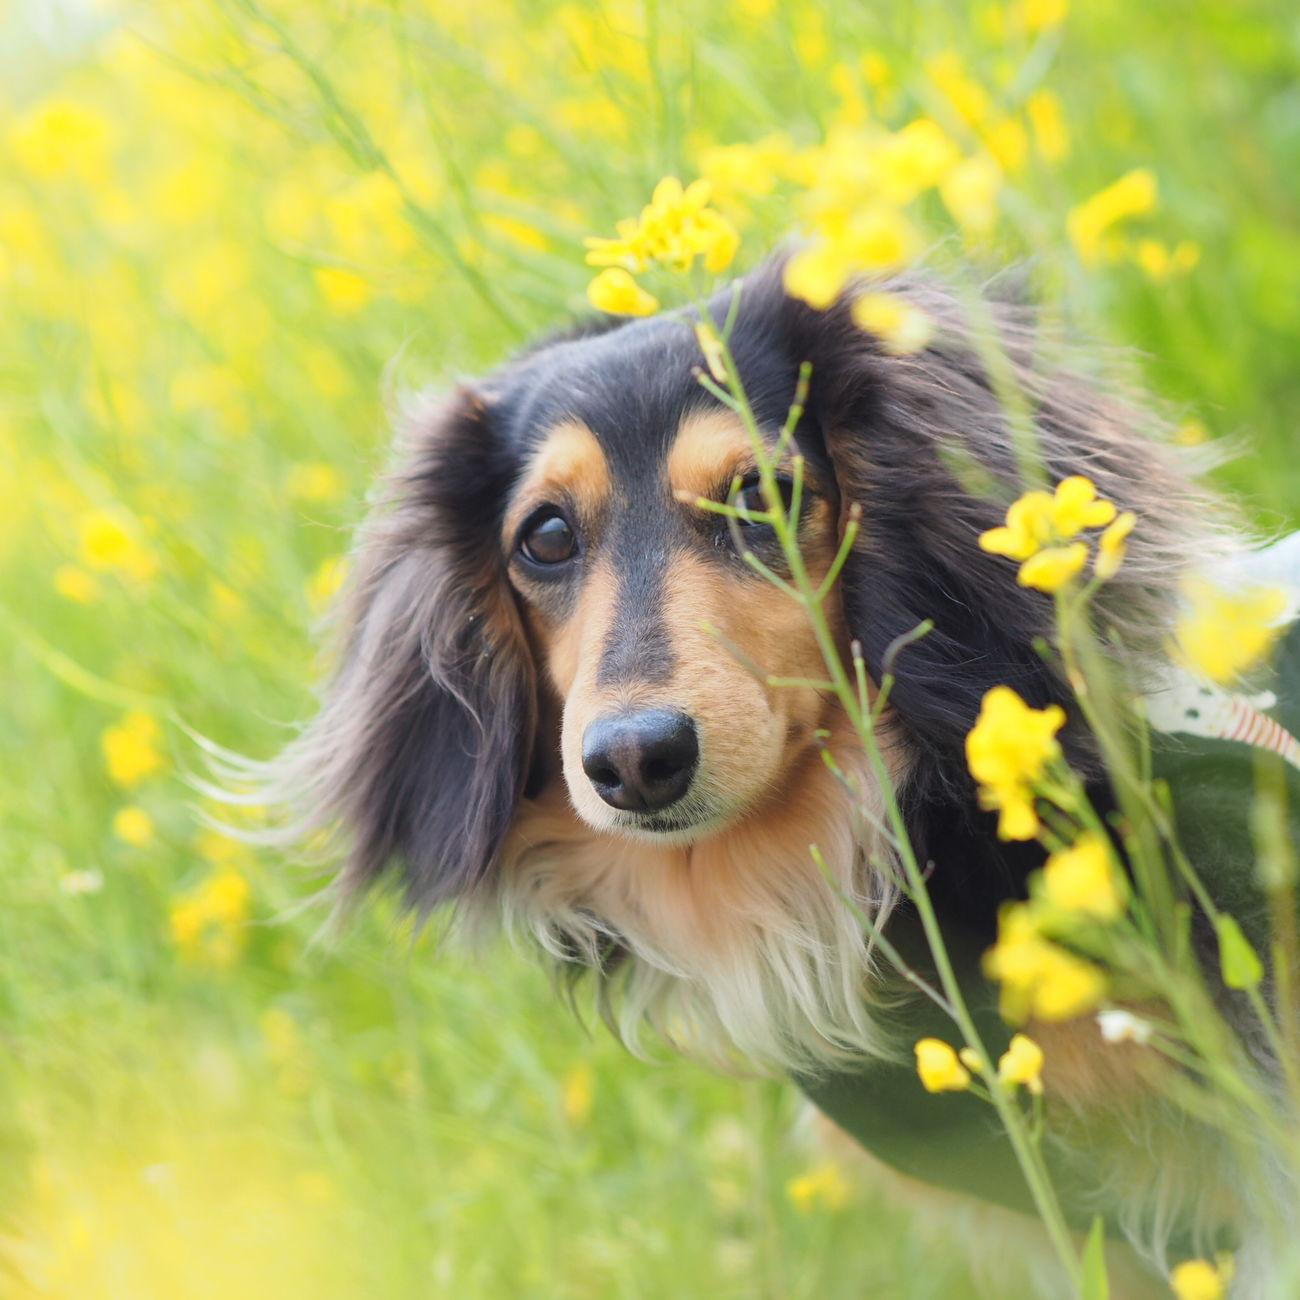 Minituredachshund Dachshund Dogs Of EyeEm Spring 春 菜の花 愛犬 Dog Walking お散歩 Yellow Rapeblossom RapeFlowers